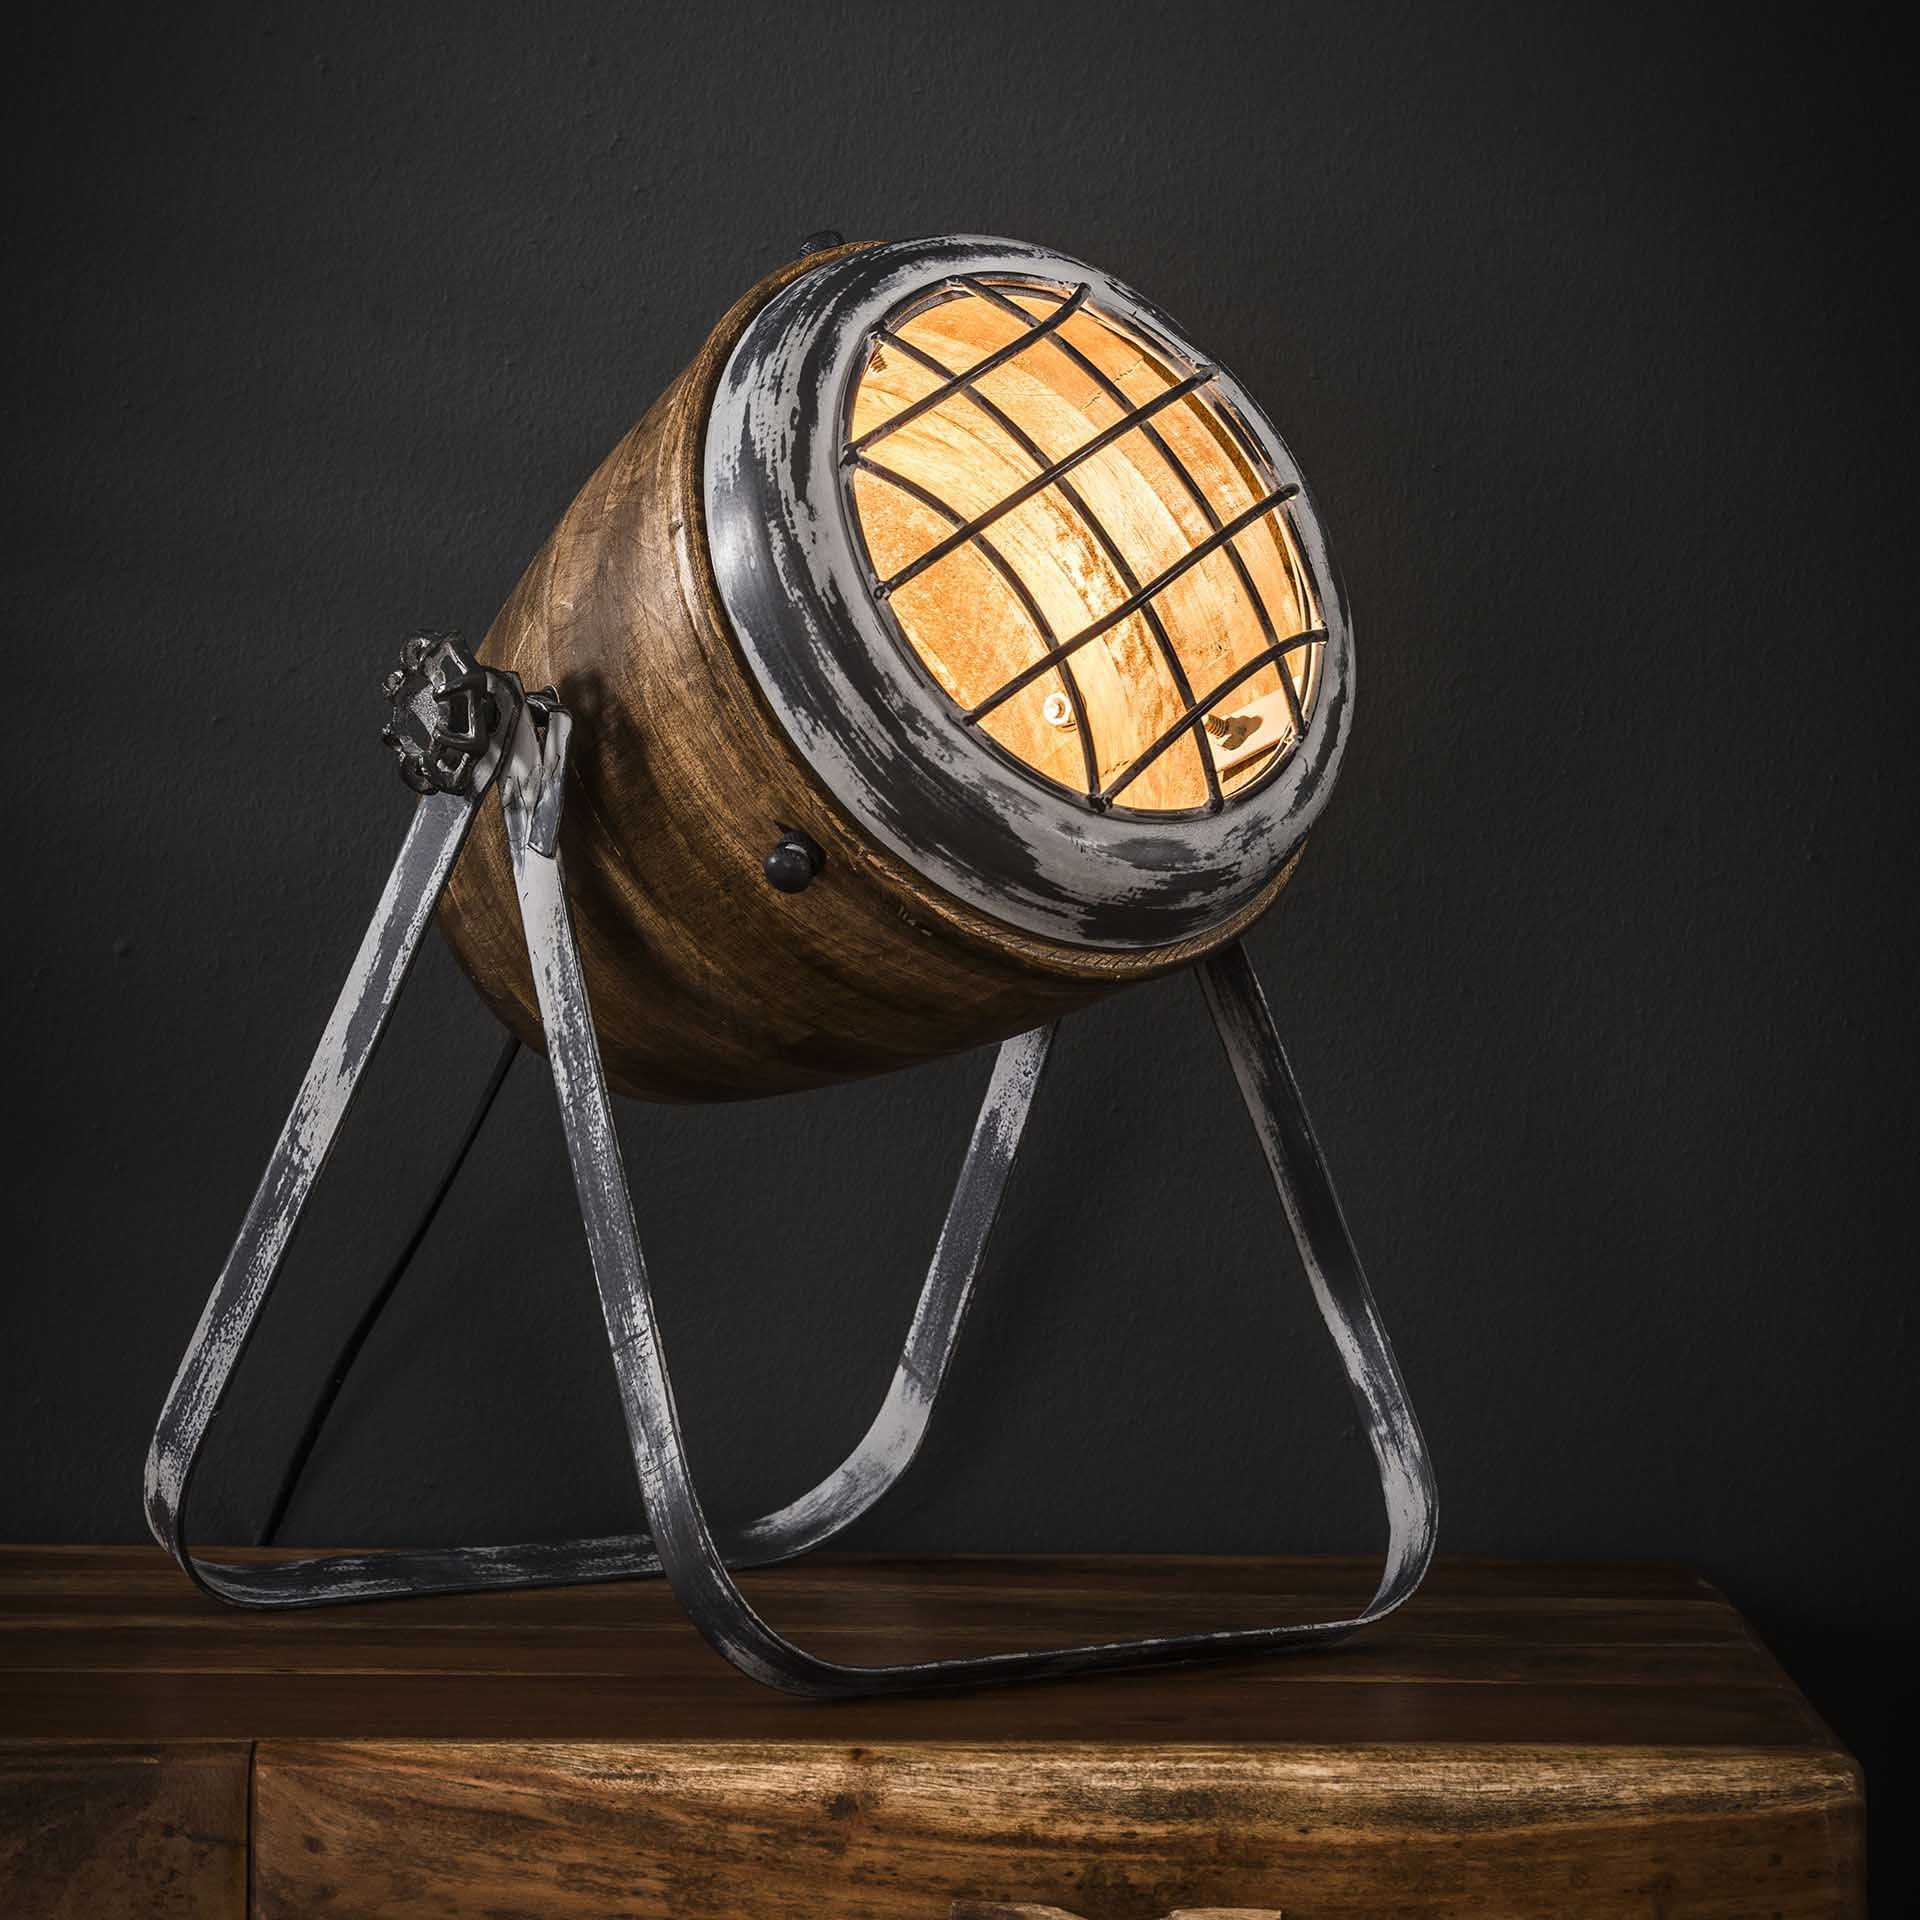 Tafellamp 'Mira' Verlichting | Tafellampen kopen